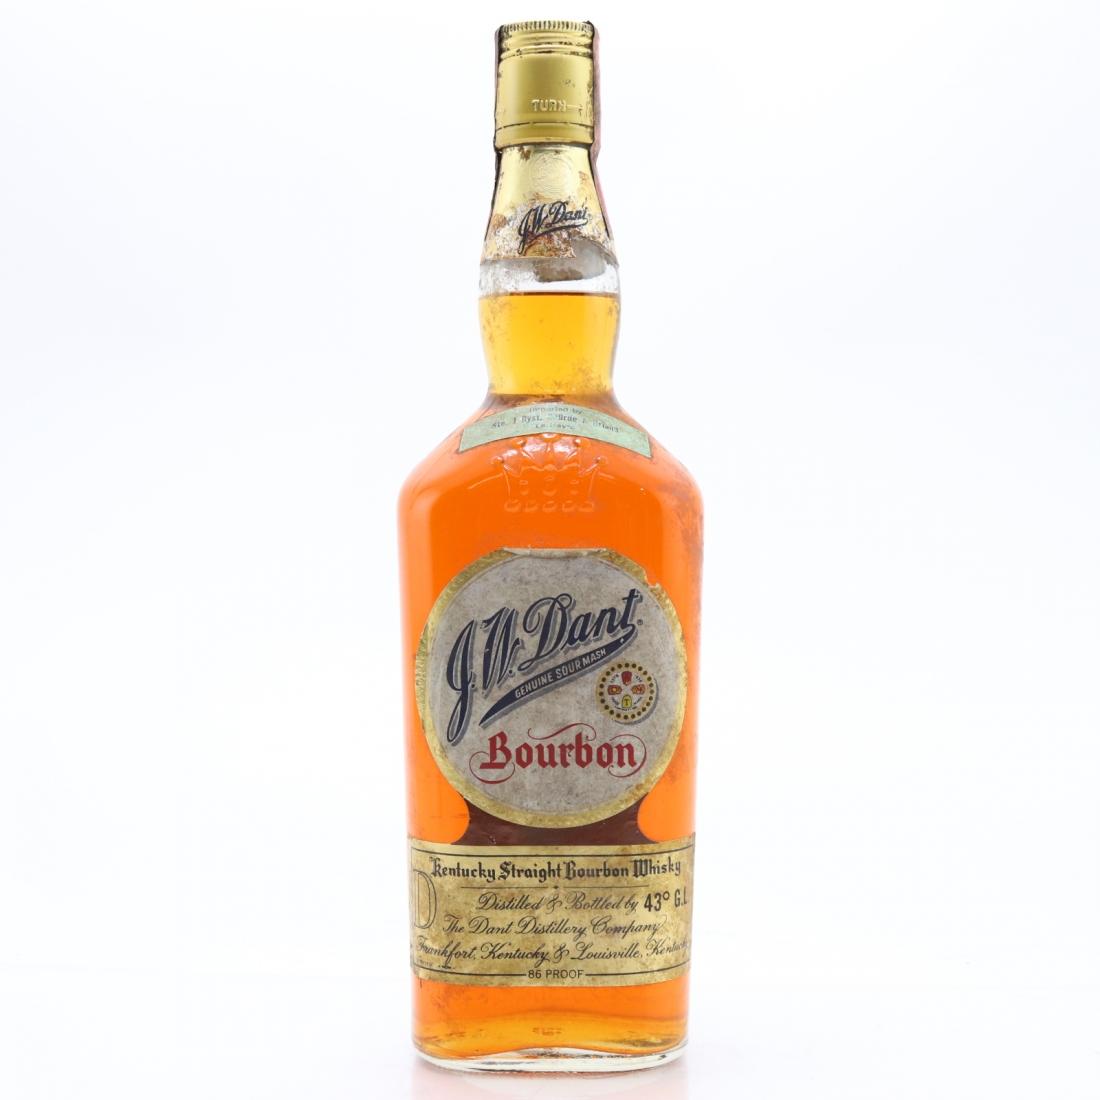 J.W. Dant Kentucky Straight Bourbon 1970s